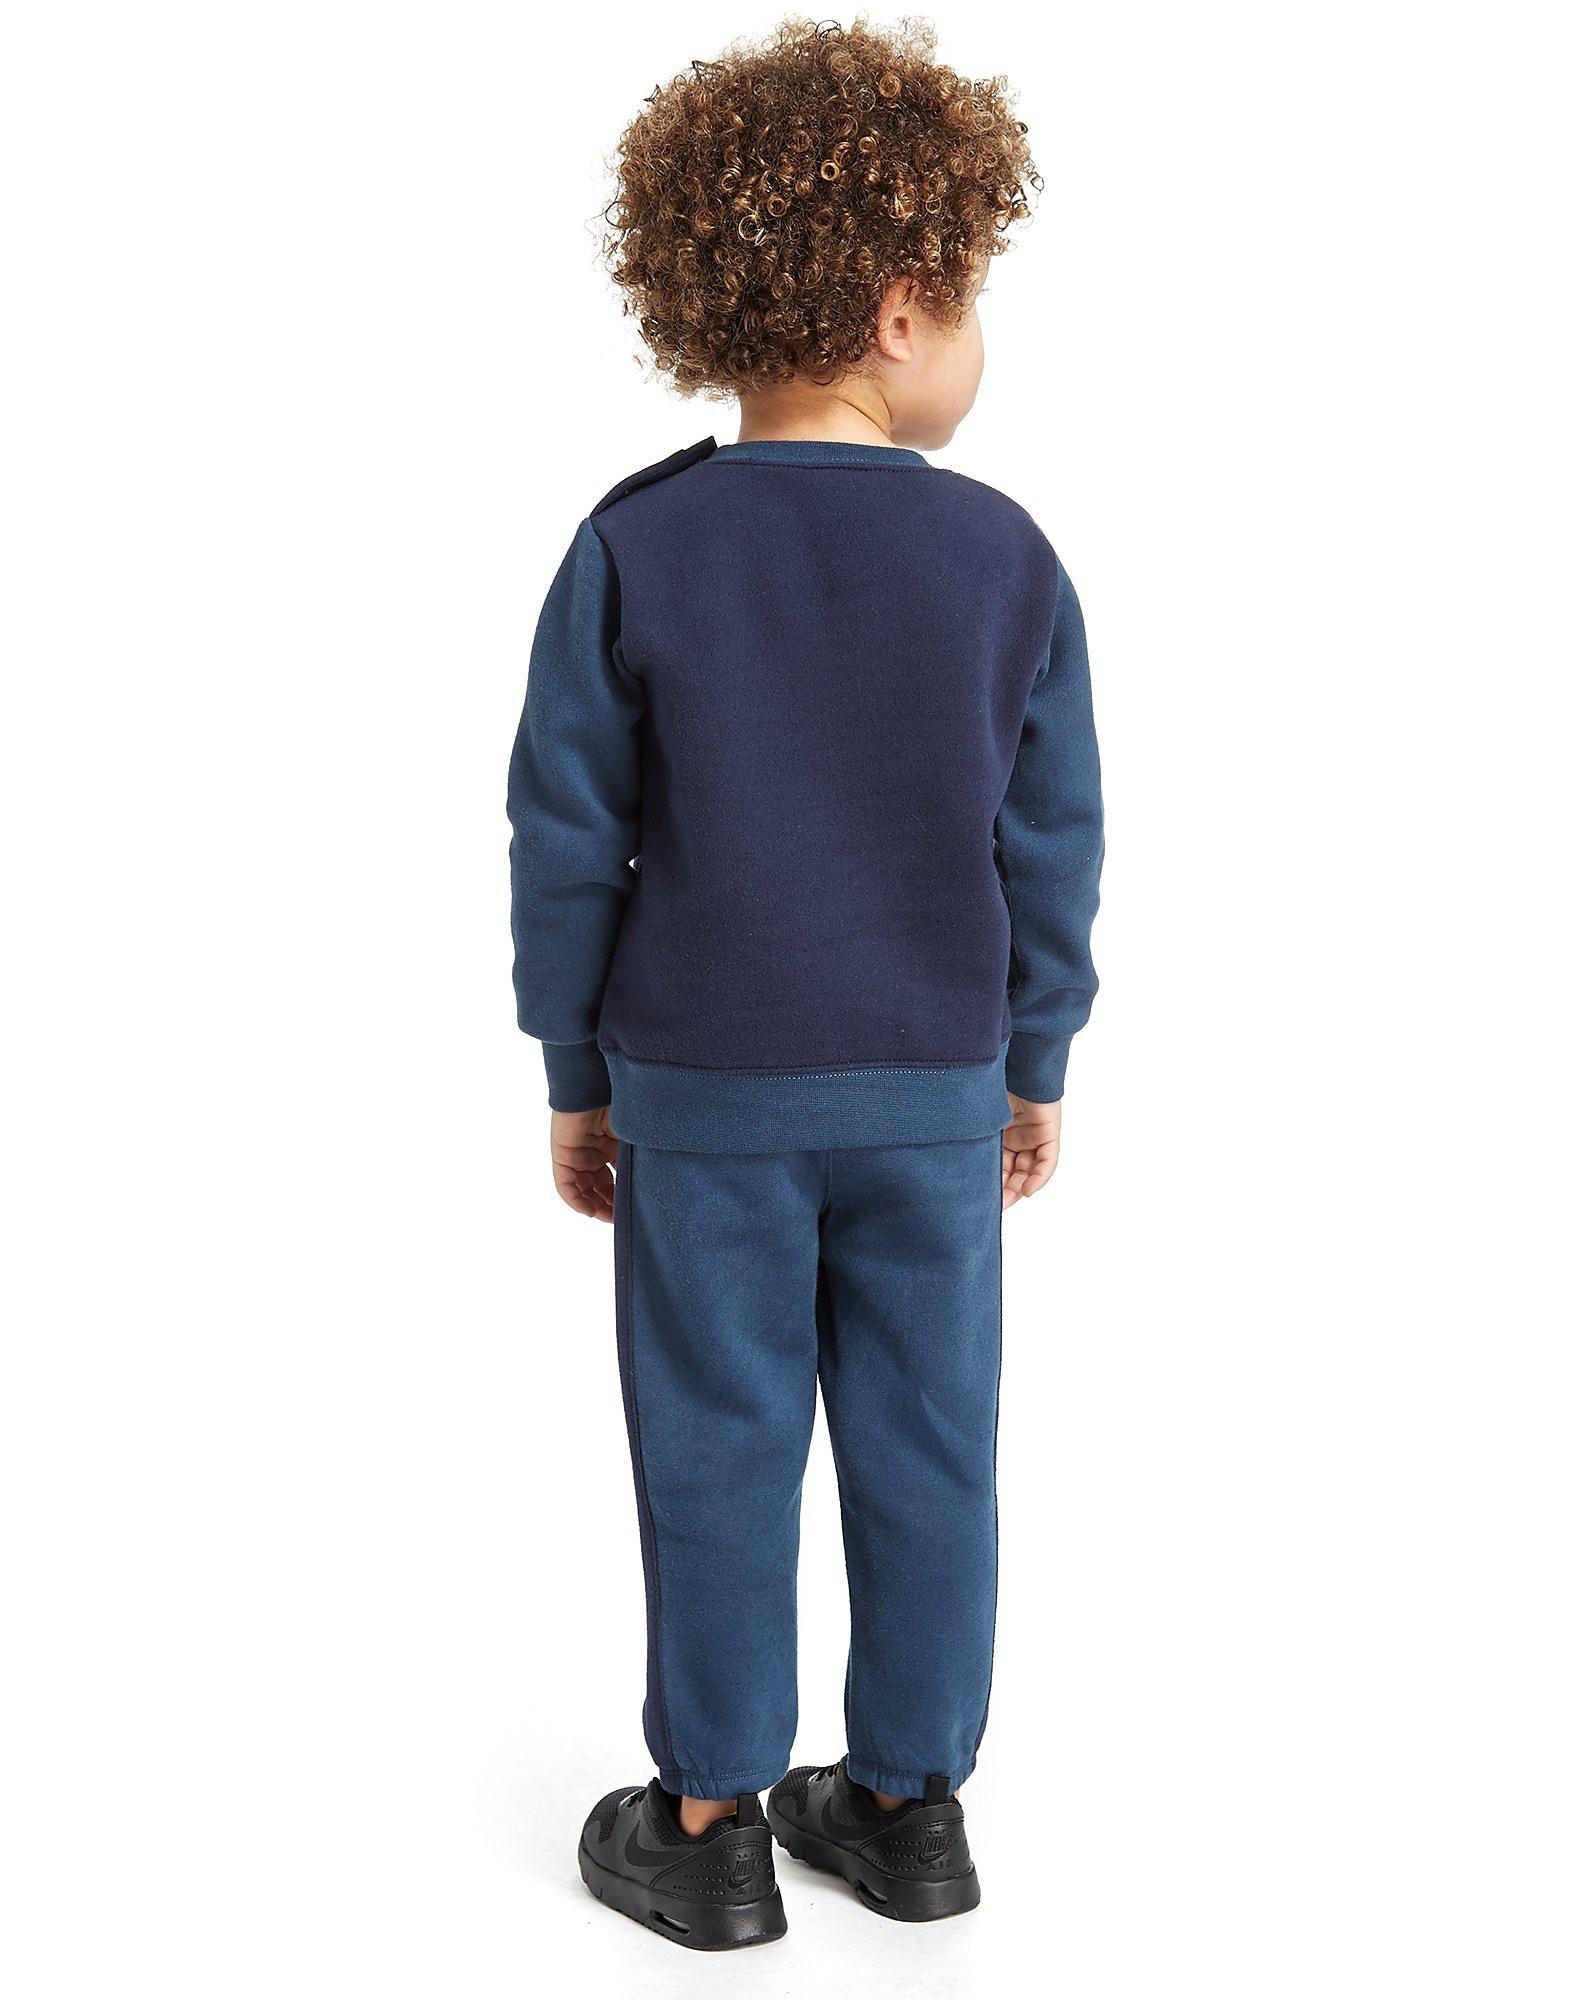 Nike Air Suit Pak Baby